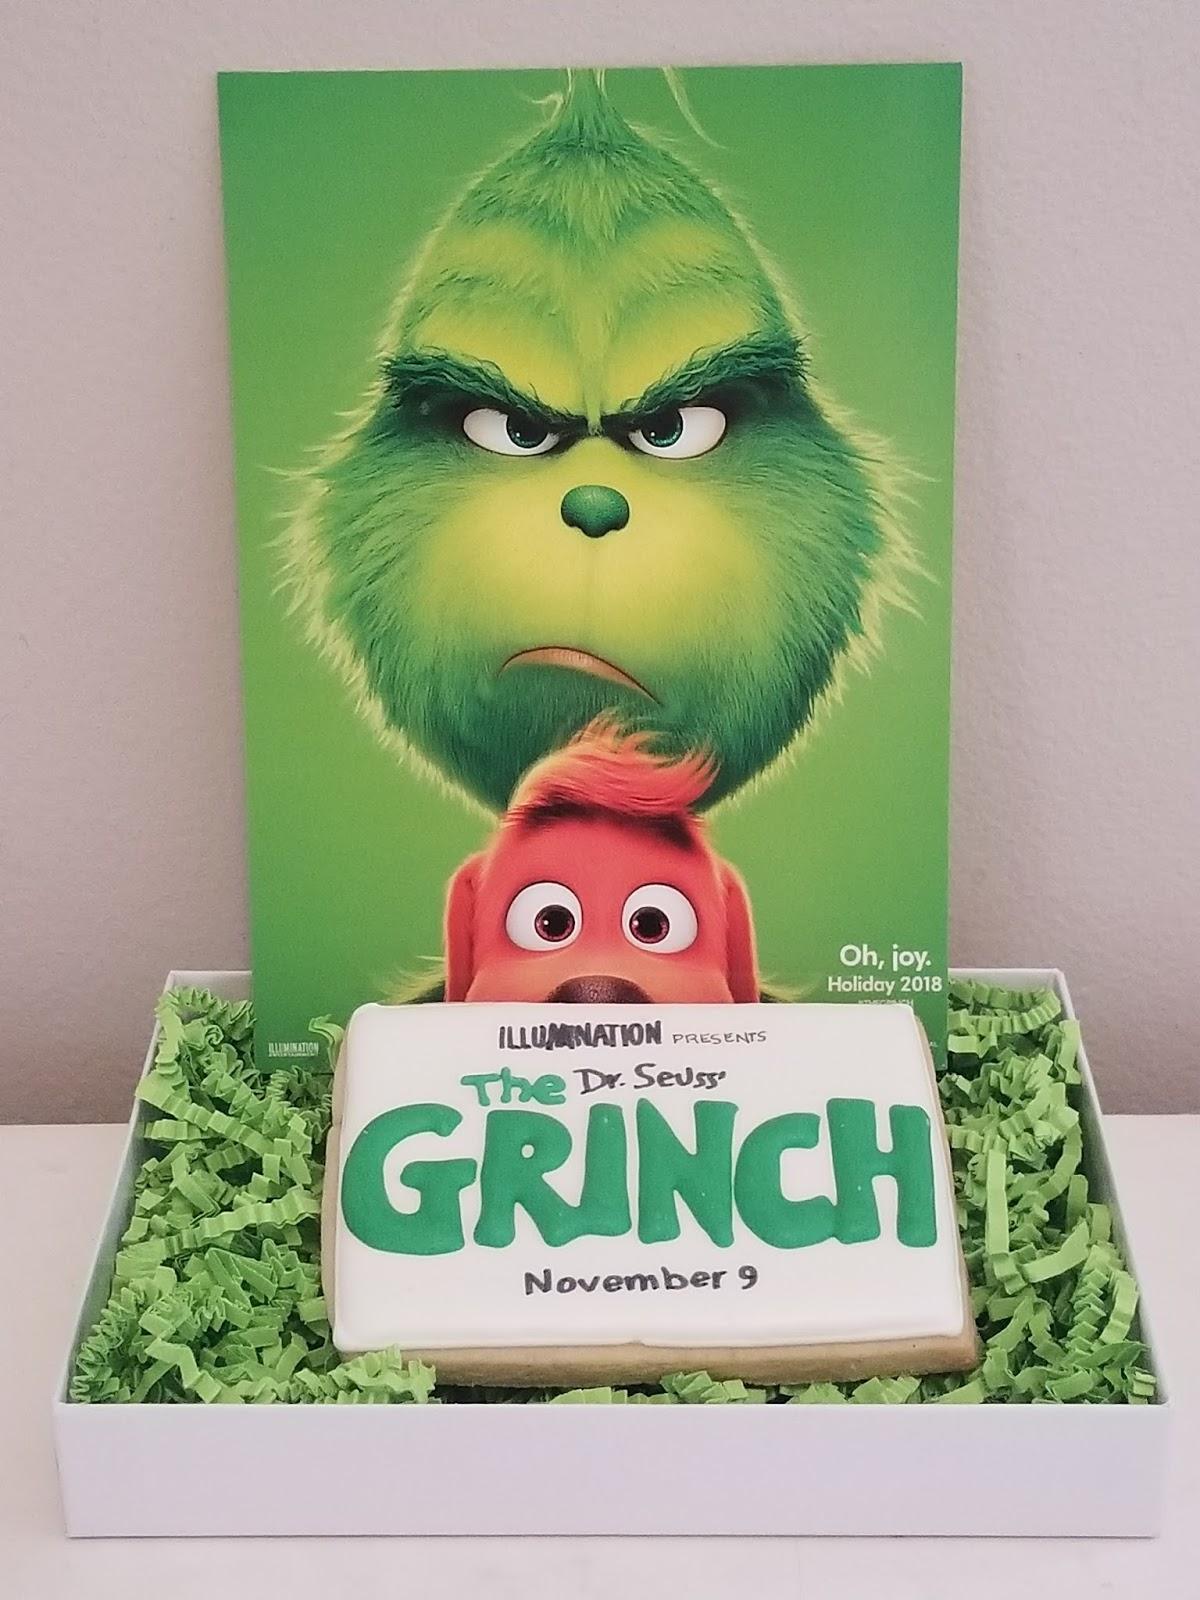 dr seuss the grinch who stole christmas full movie cartoon